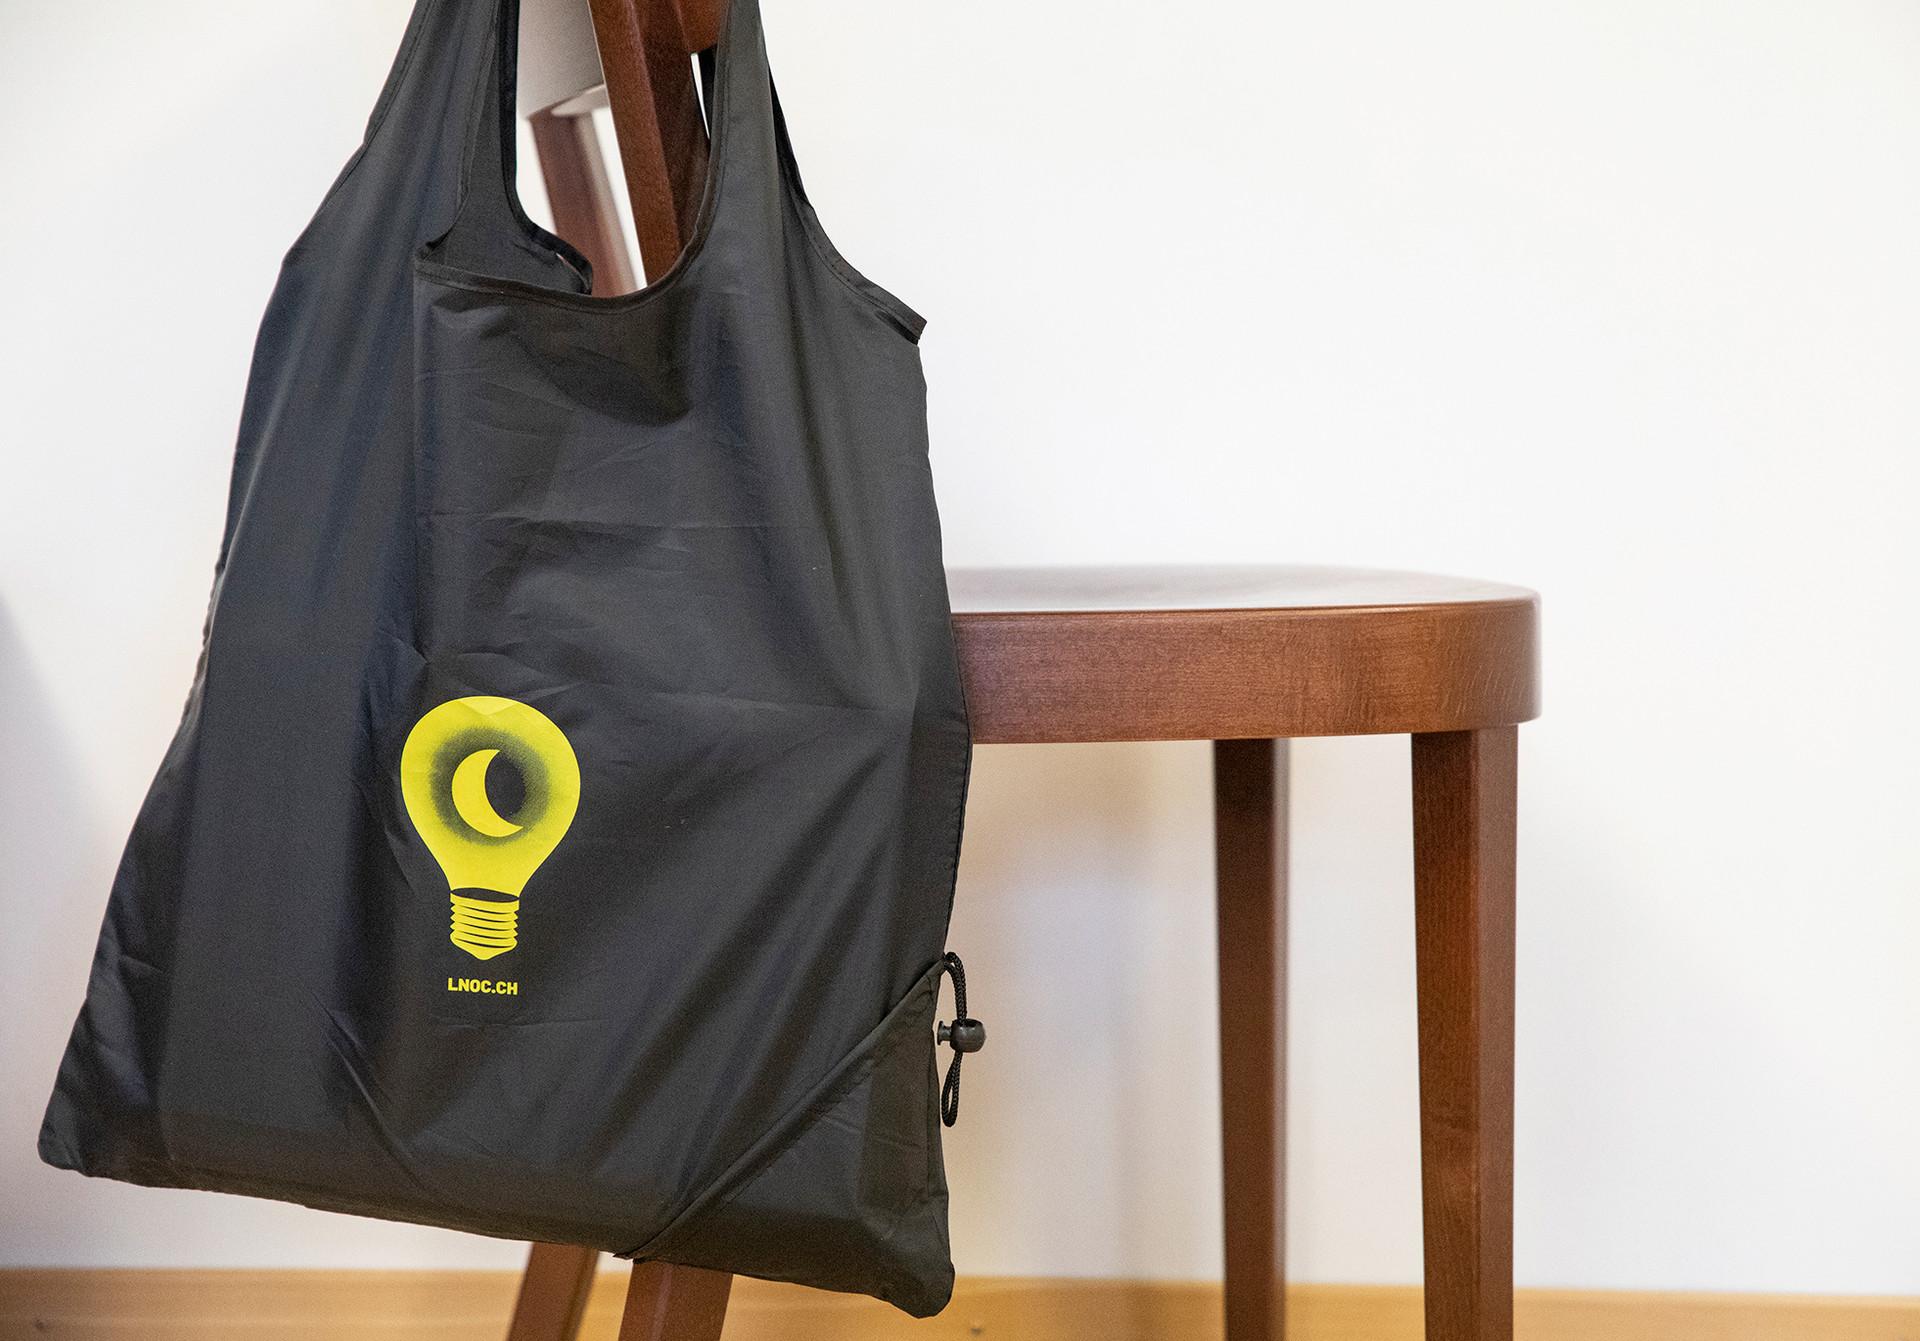 LNOC Bag